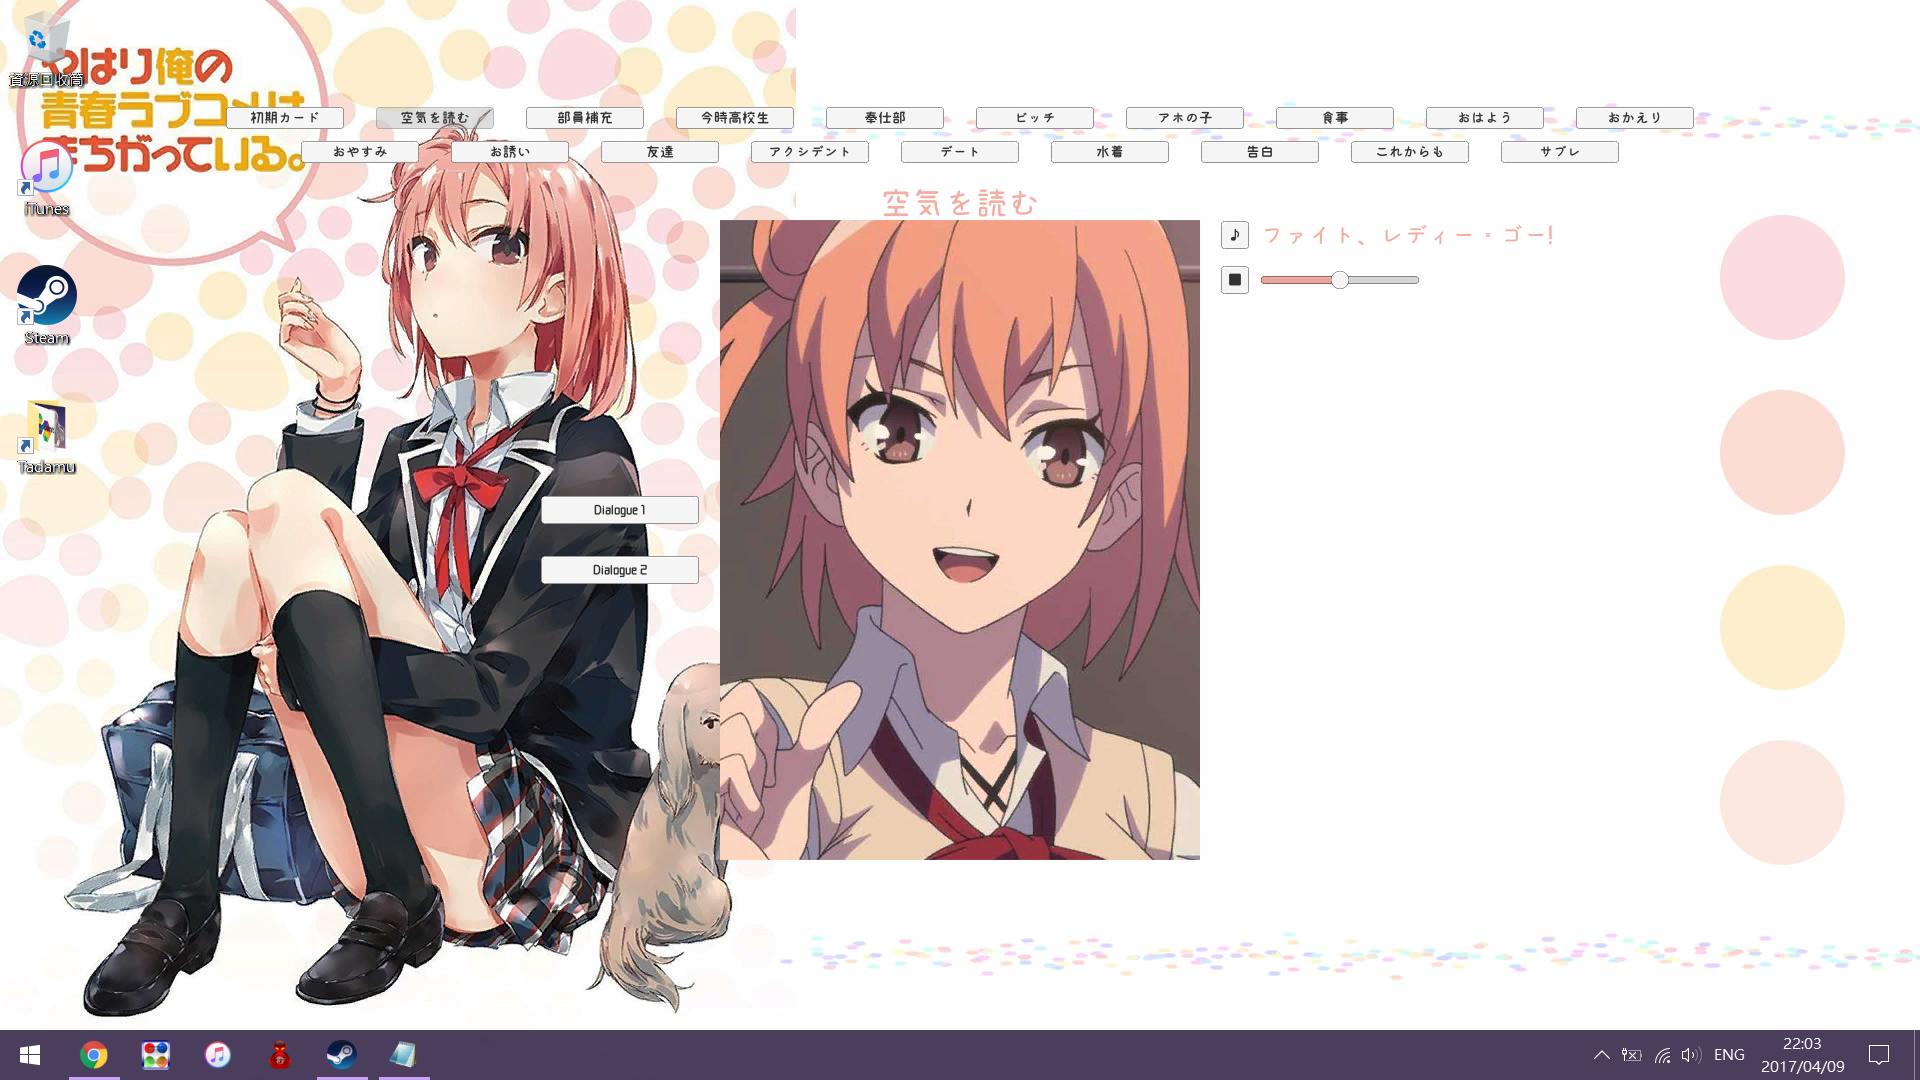 Wallpaper Engine - OreGairu - Yui interactive wallpaper